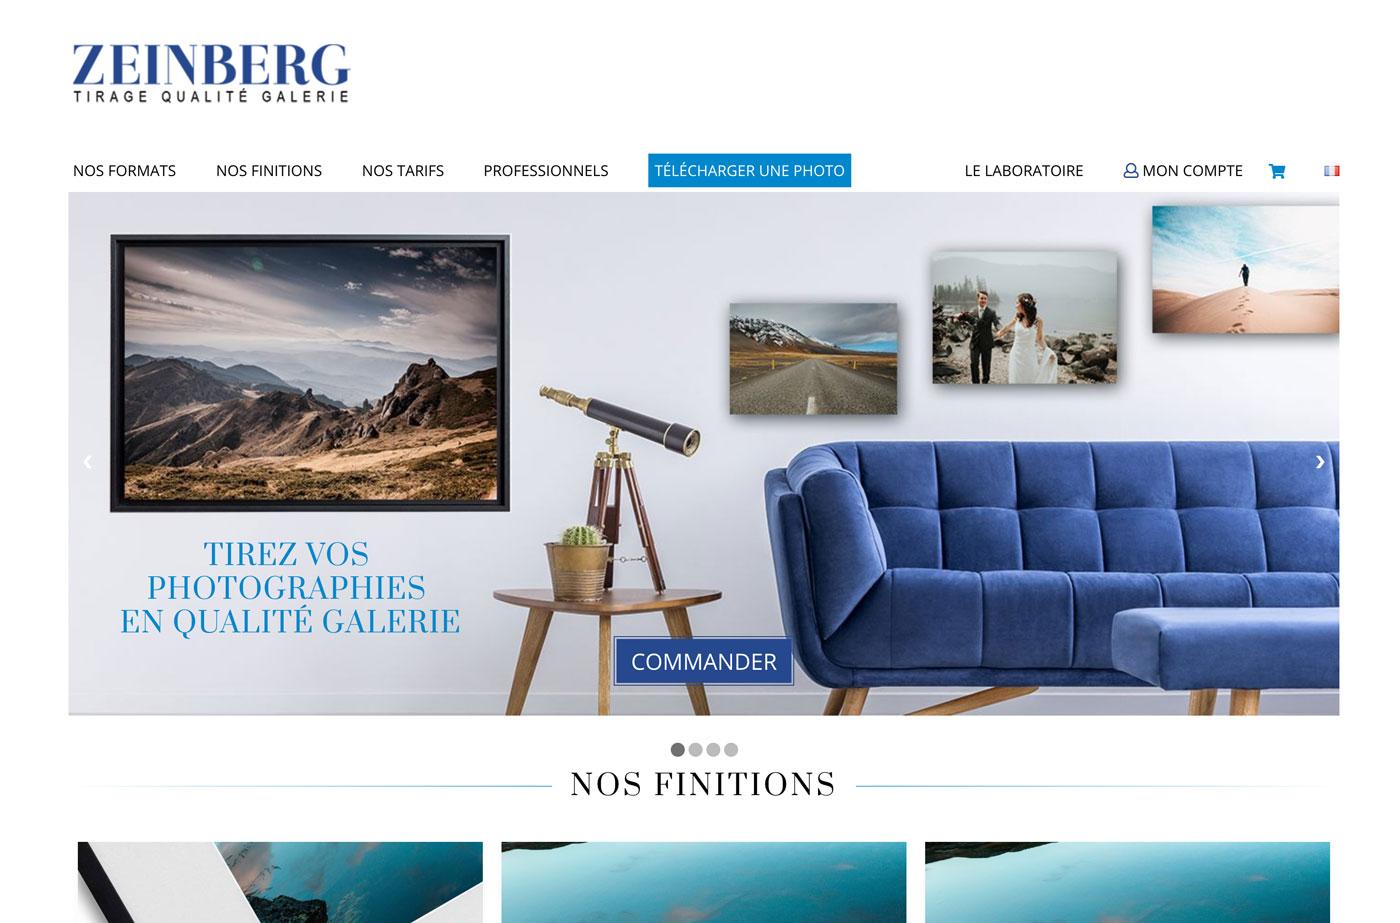 zeinberg met jour son site internet plus clair et plus simple. Black Bedroom Furniture Sets. Home Design Ideas